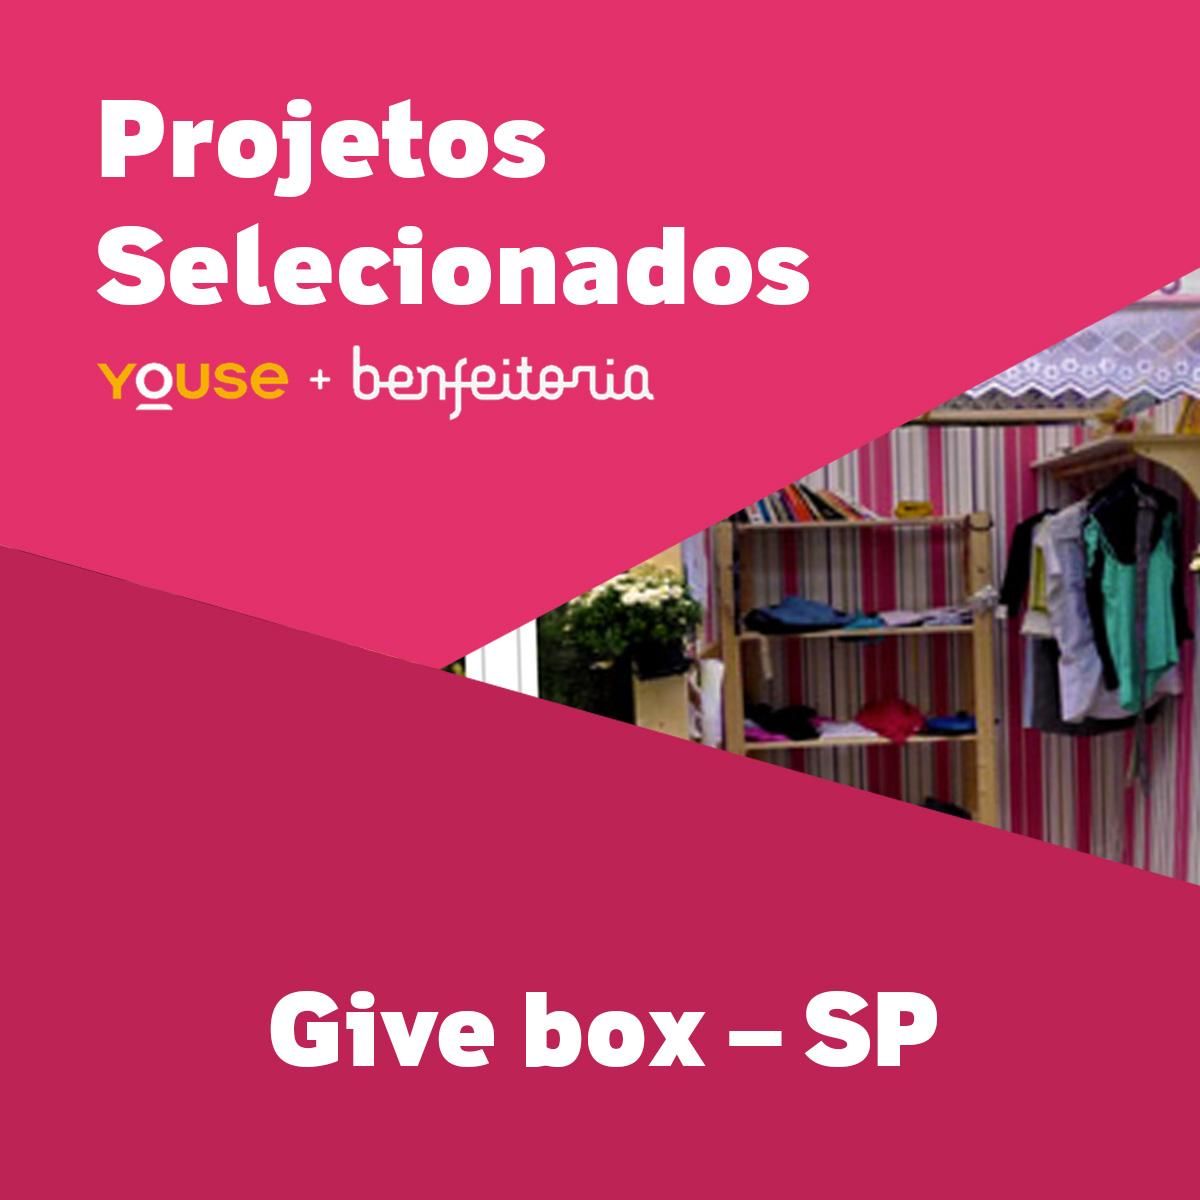 Projetos Selecionados - Give box - SP